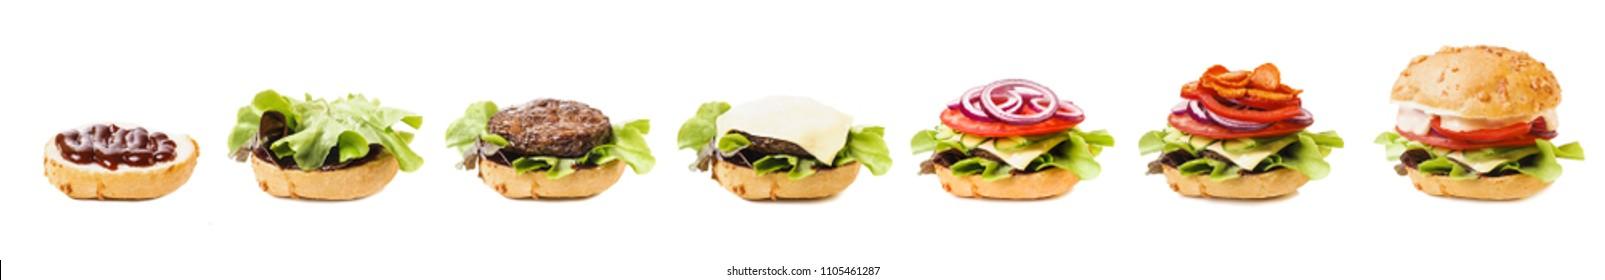 Burger ingredients isolated on white background, process of making hamburger